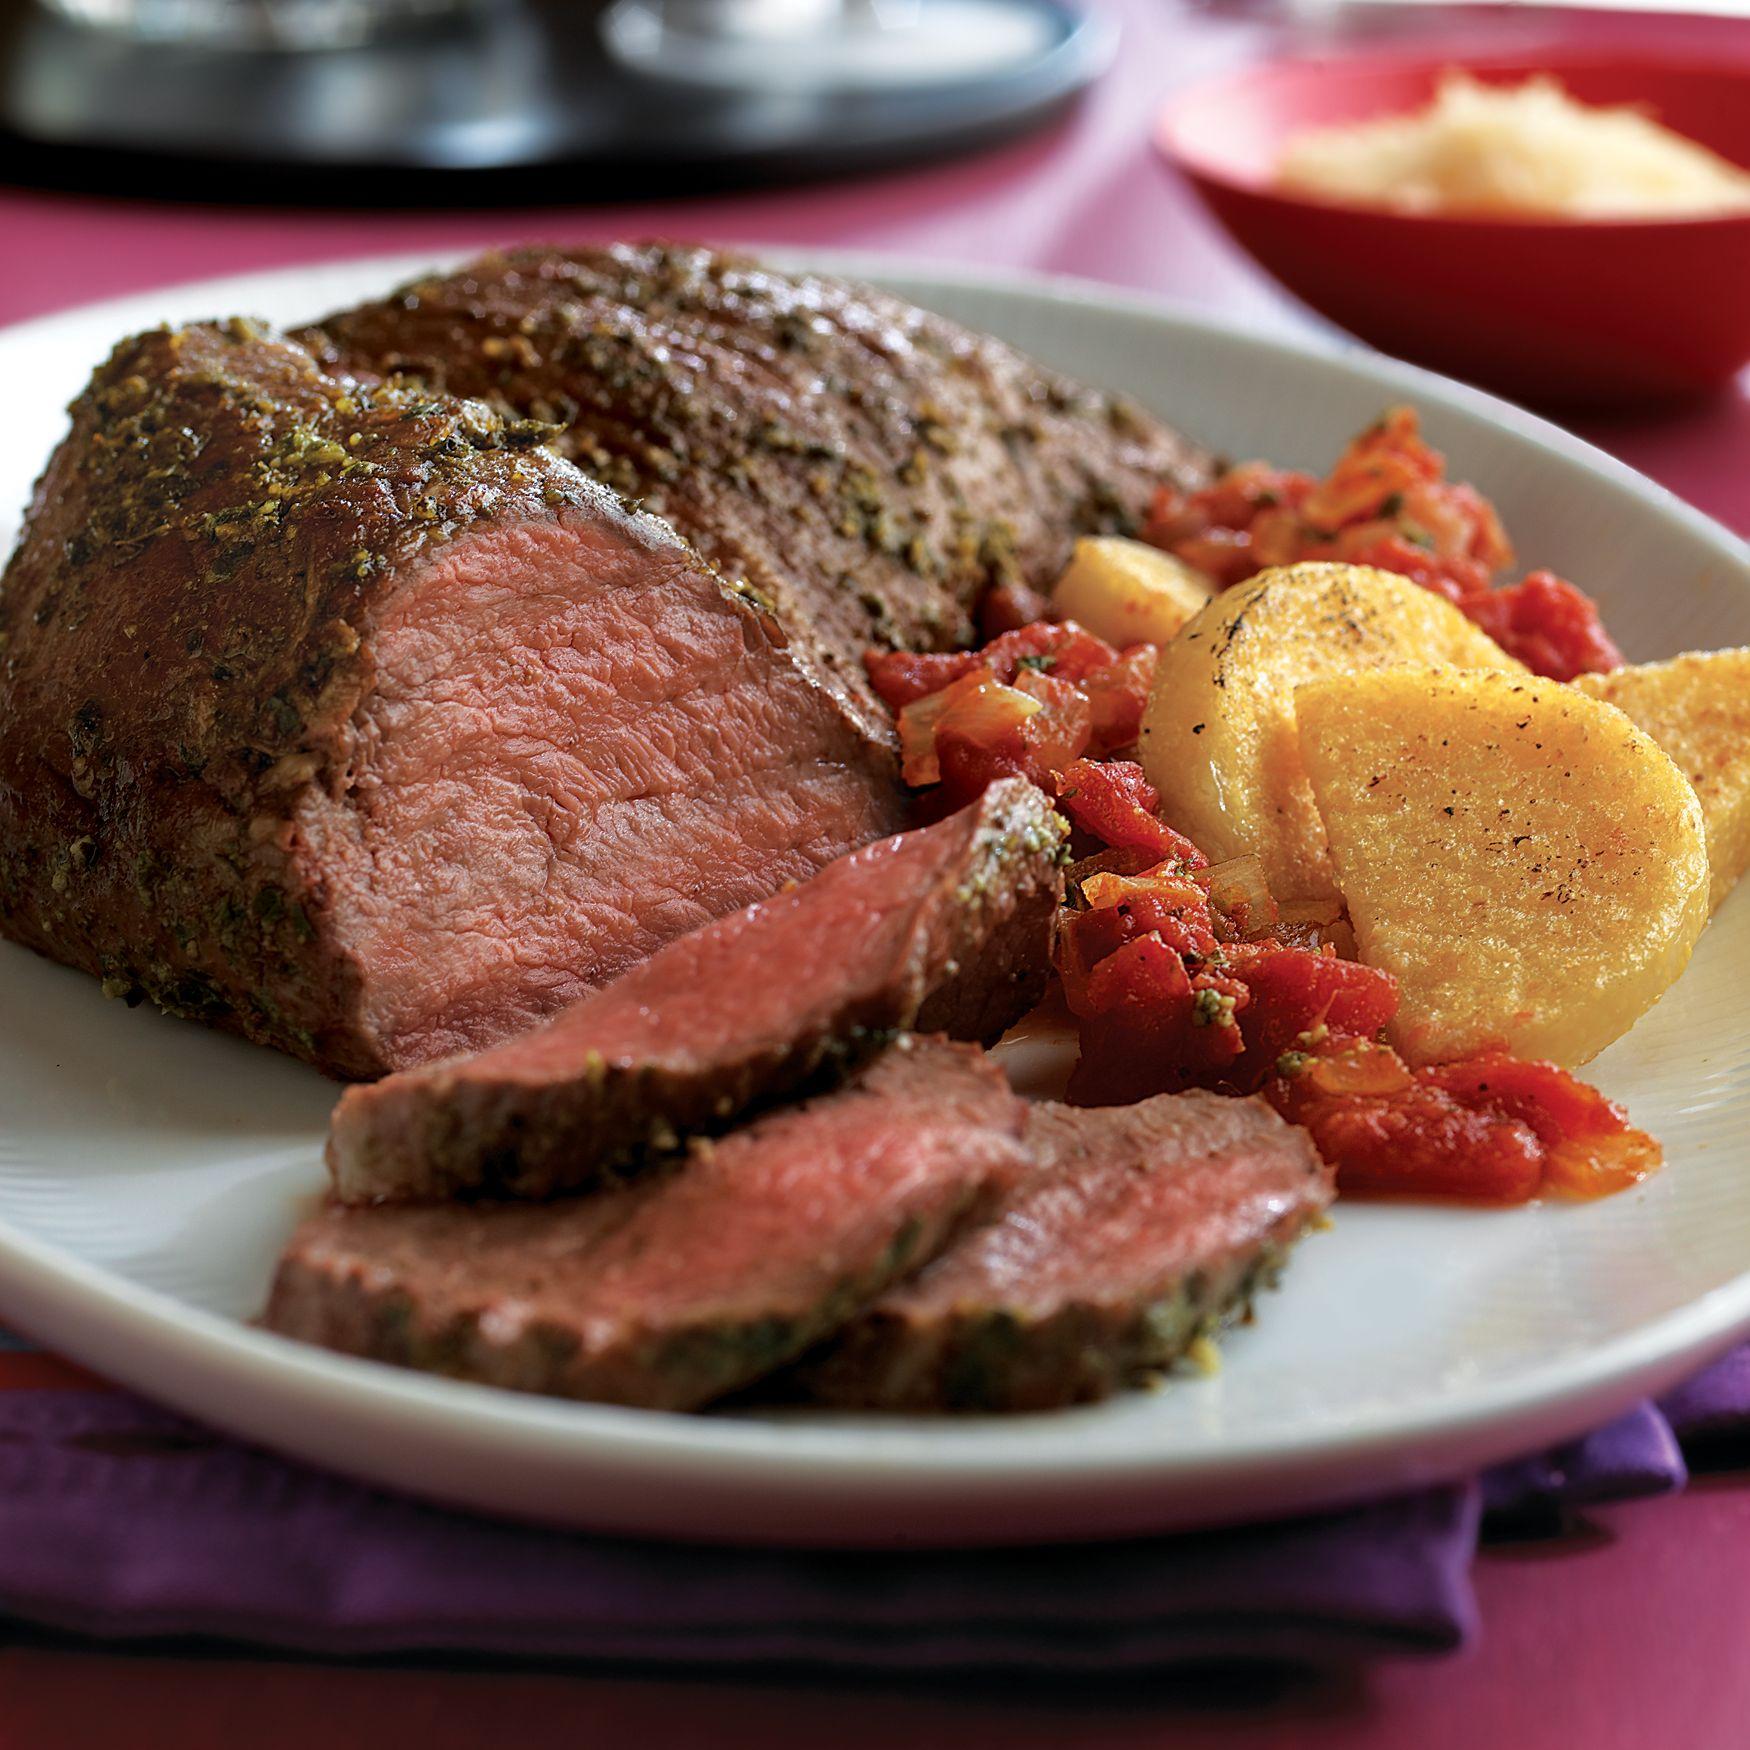 Pesto-Rubbed Tri-Tip Roast with Warm Tomato Sauce